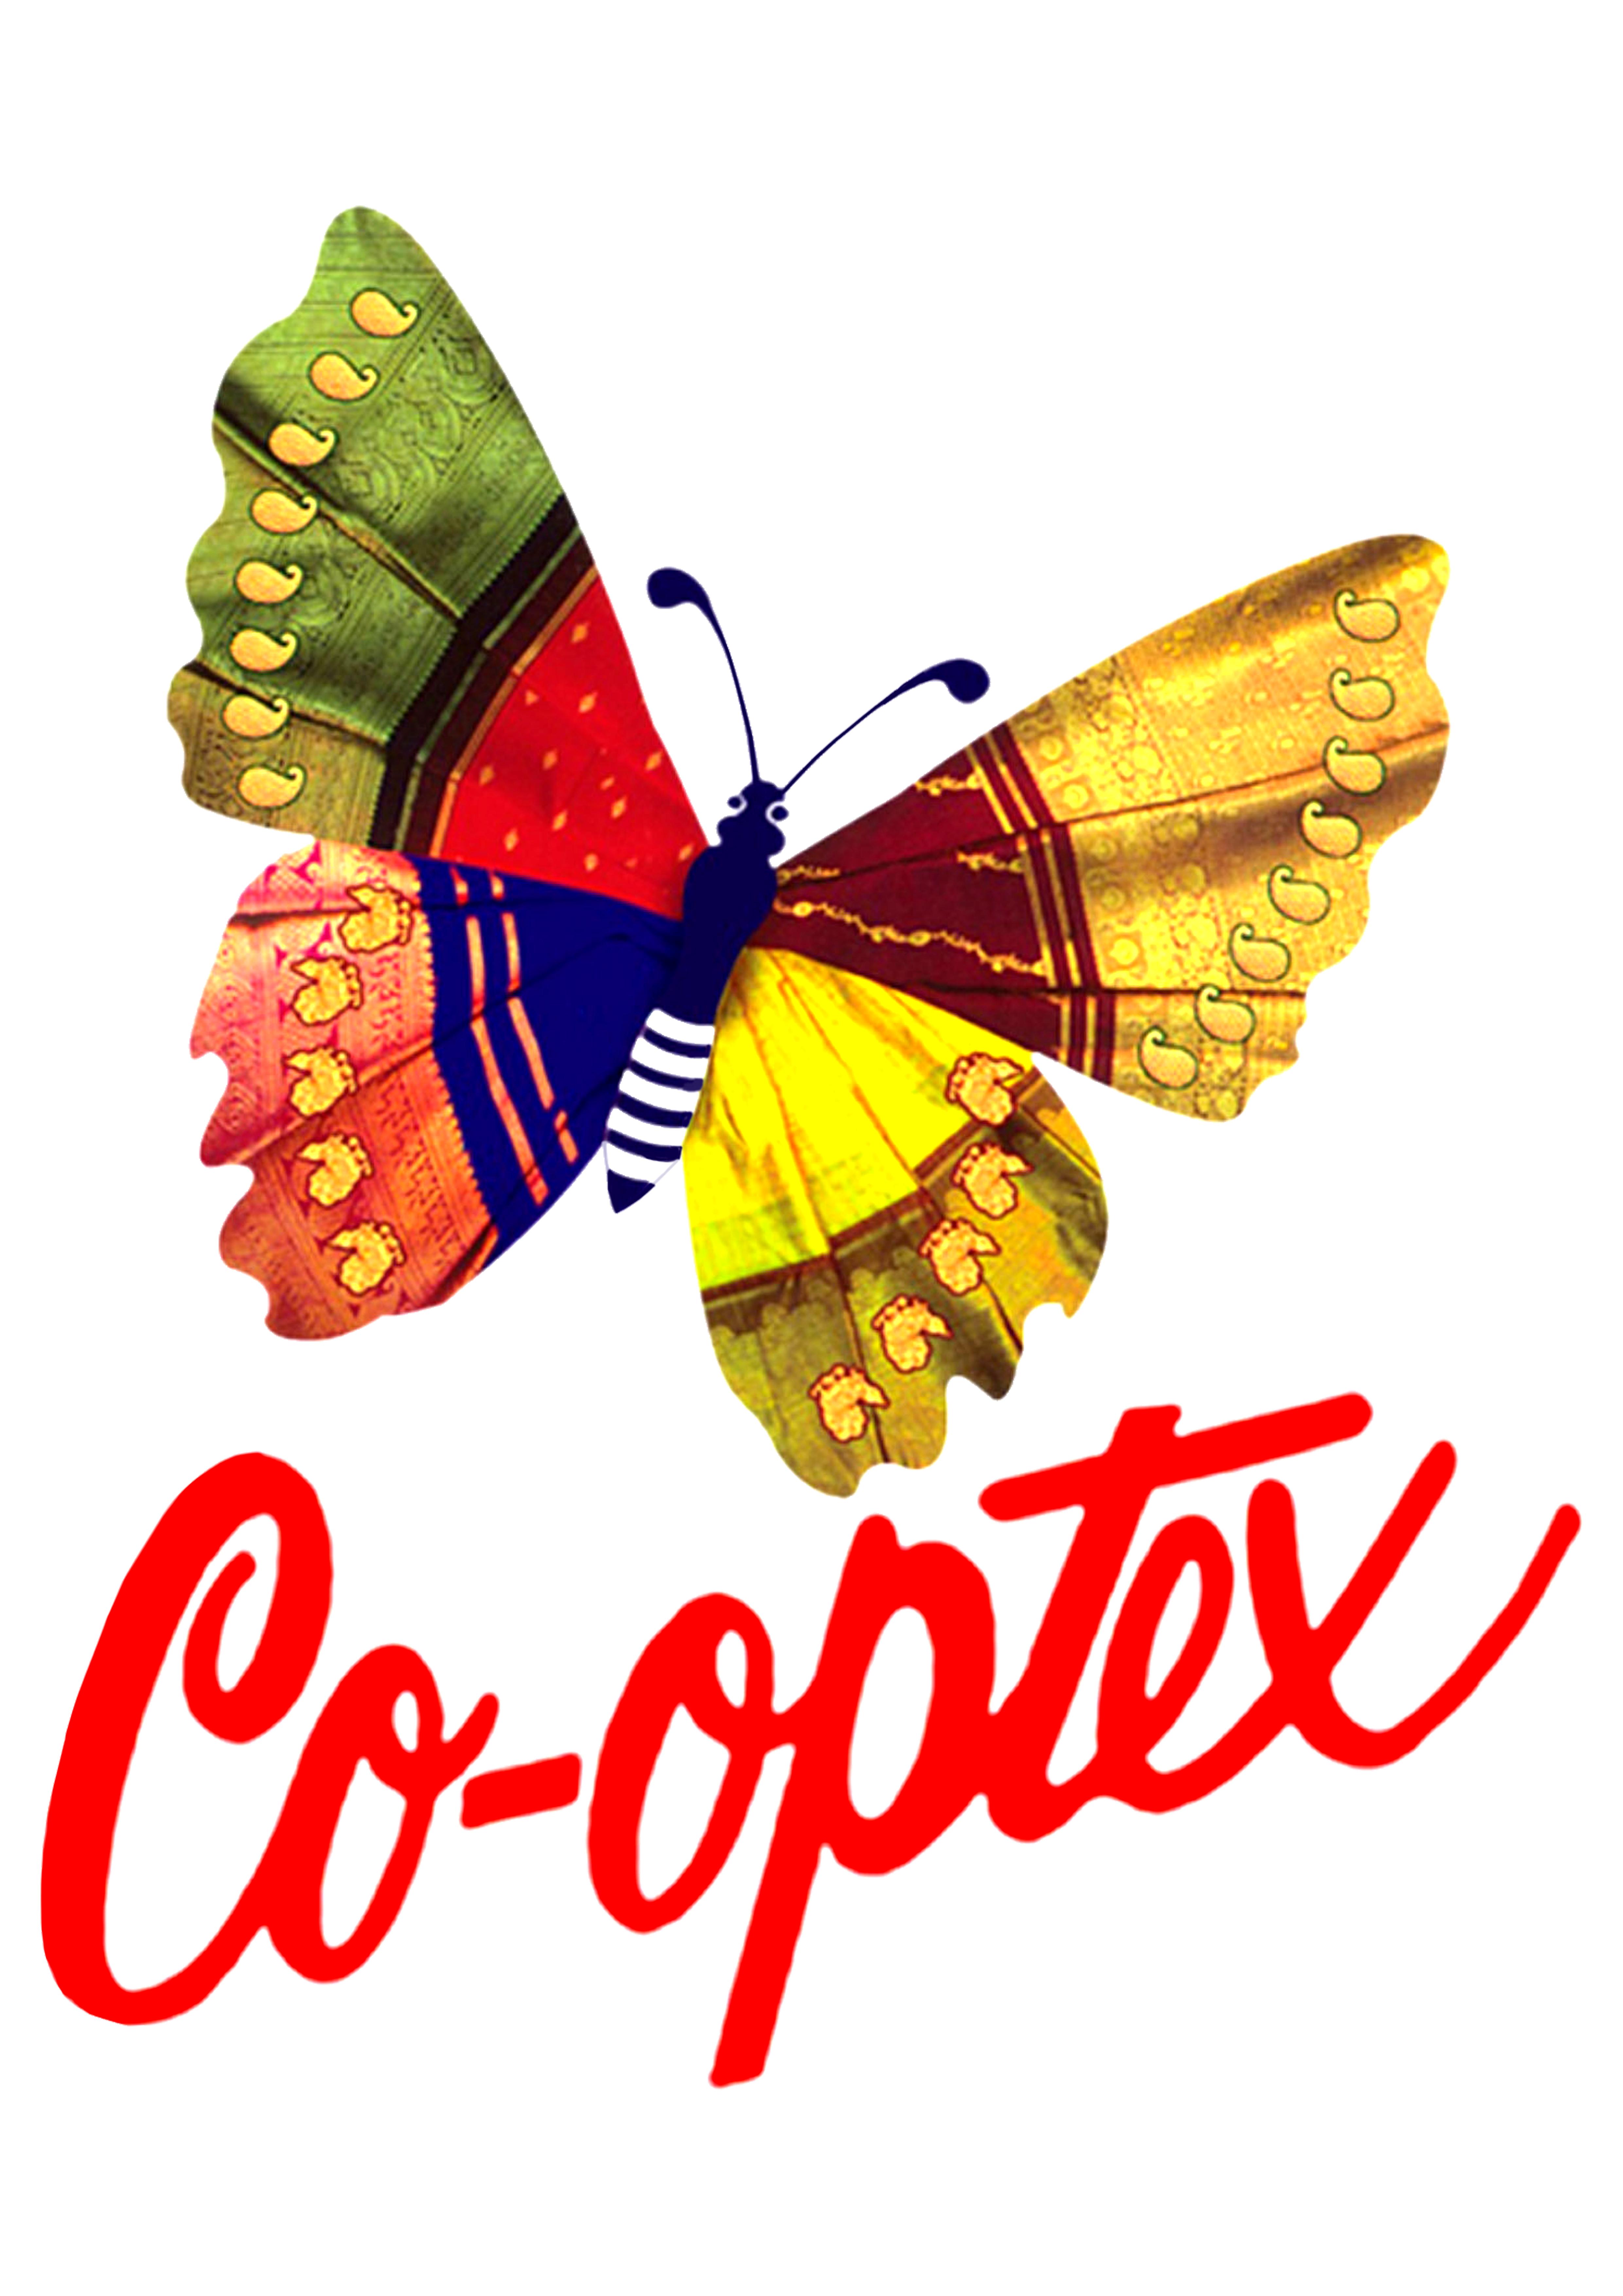 Co-optex International